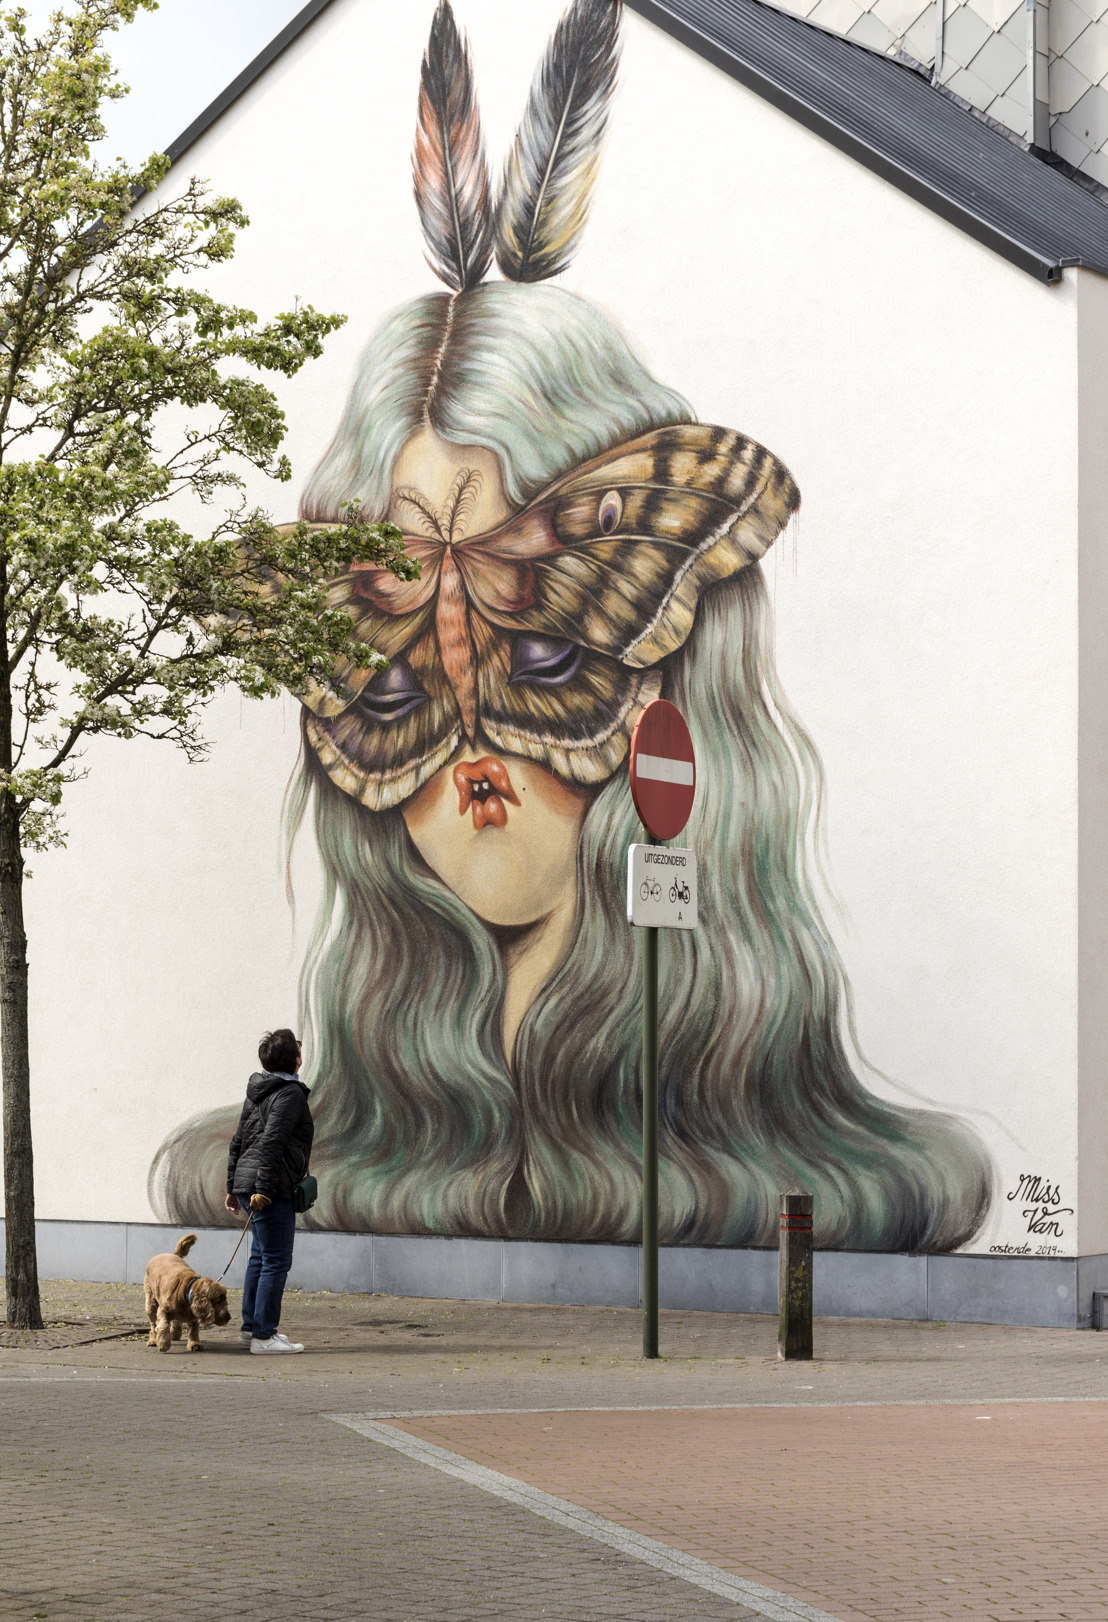 🌊 Zonnige doe-tip in Oostende 🌊 volg het gratis artistiek parcours van The Crystal Ship